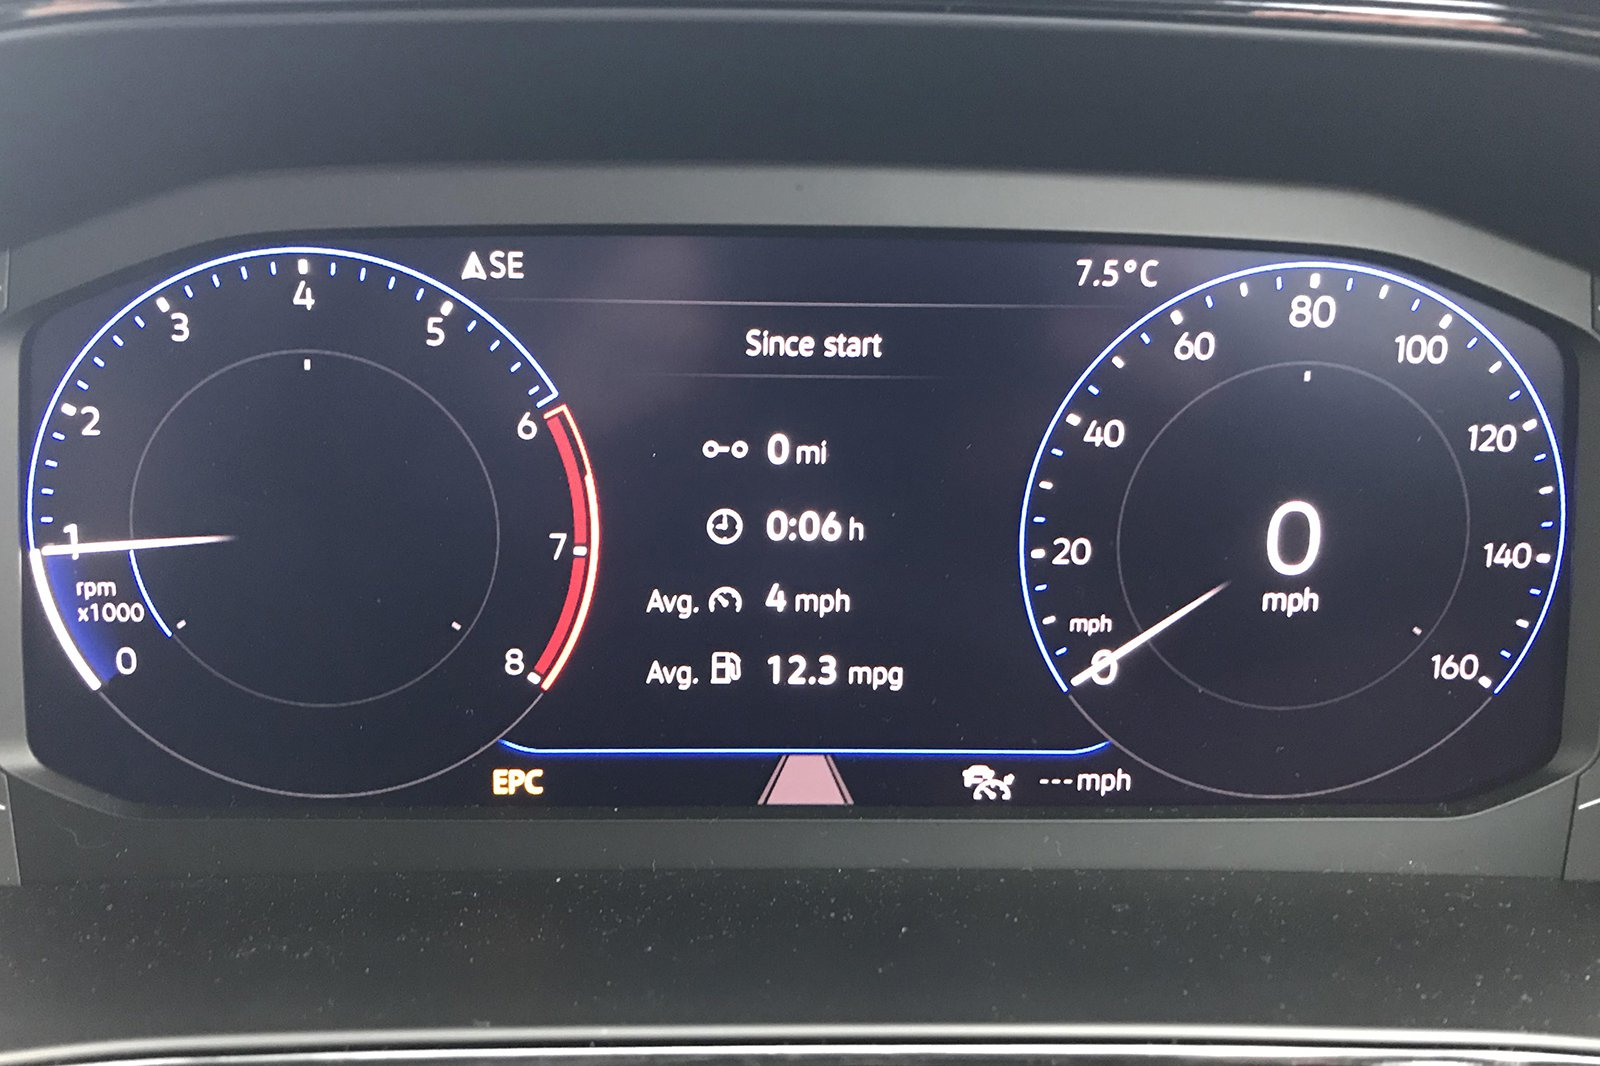 VW T-Cross EPC light